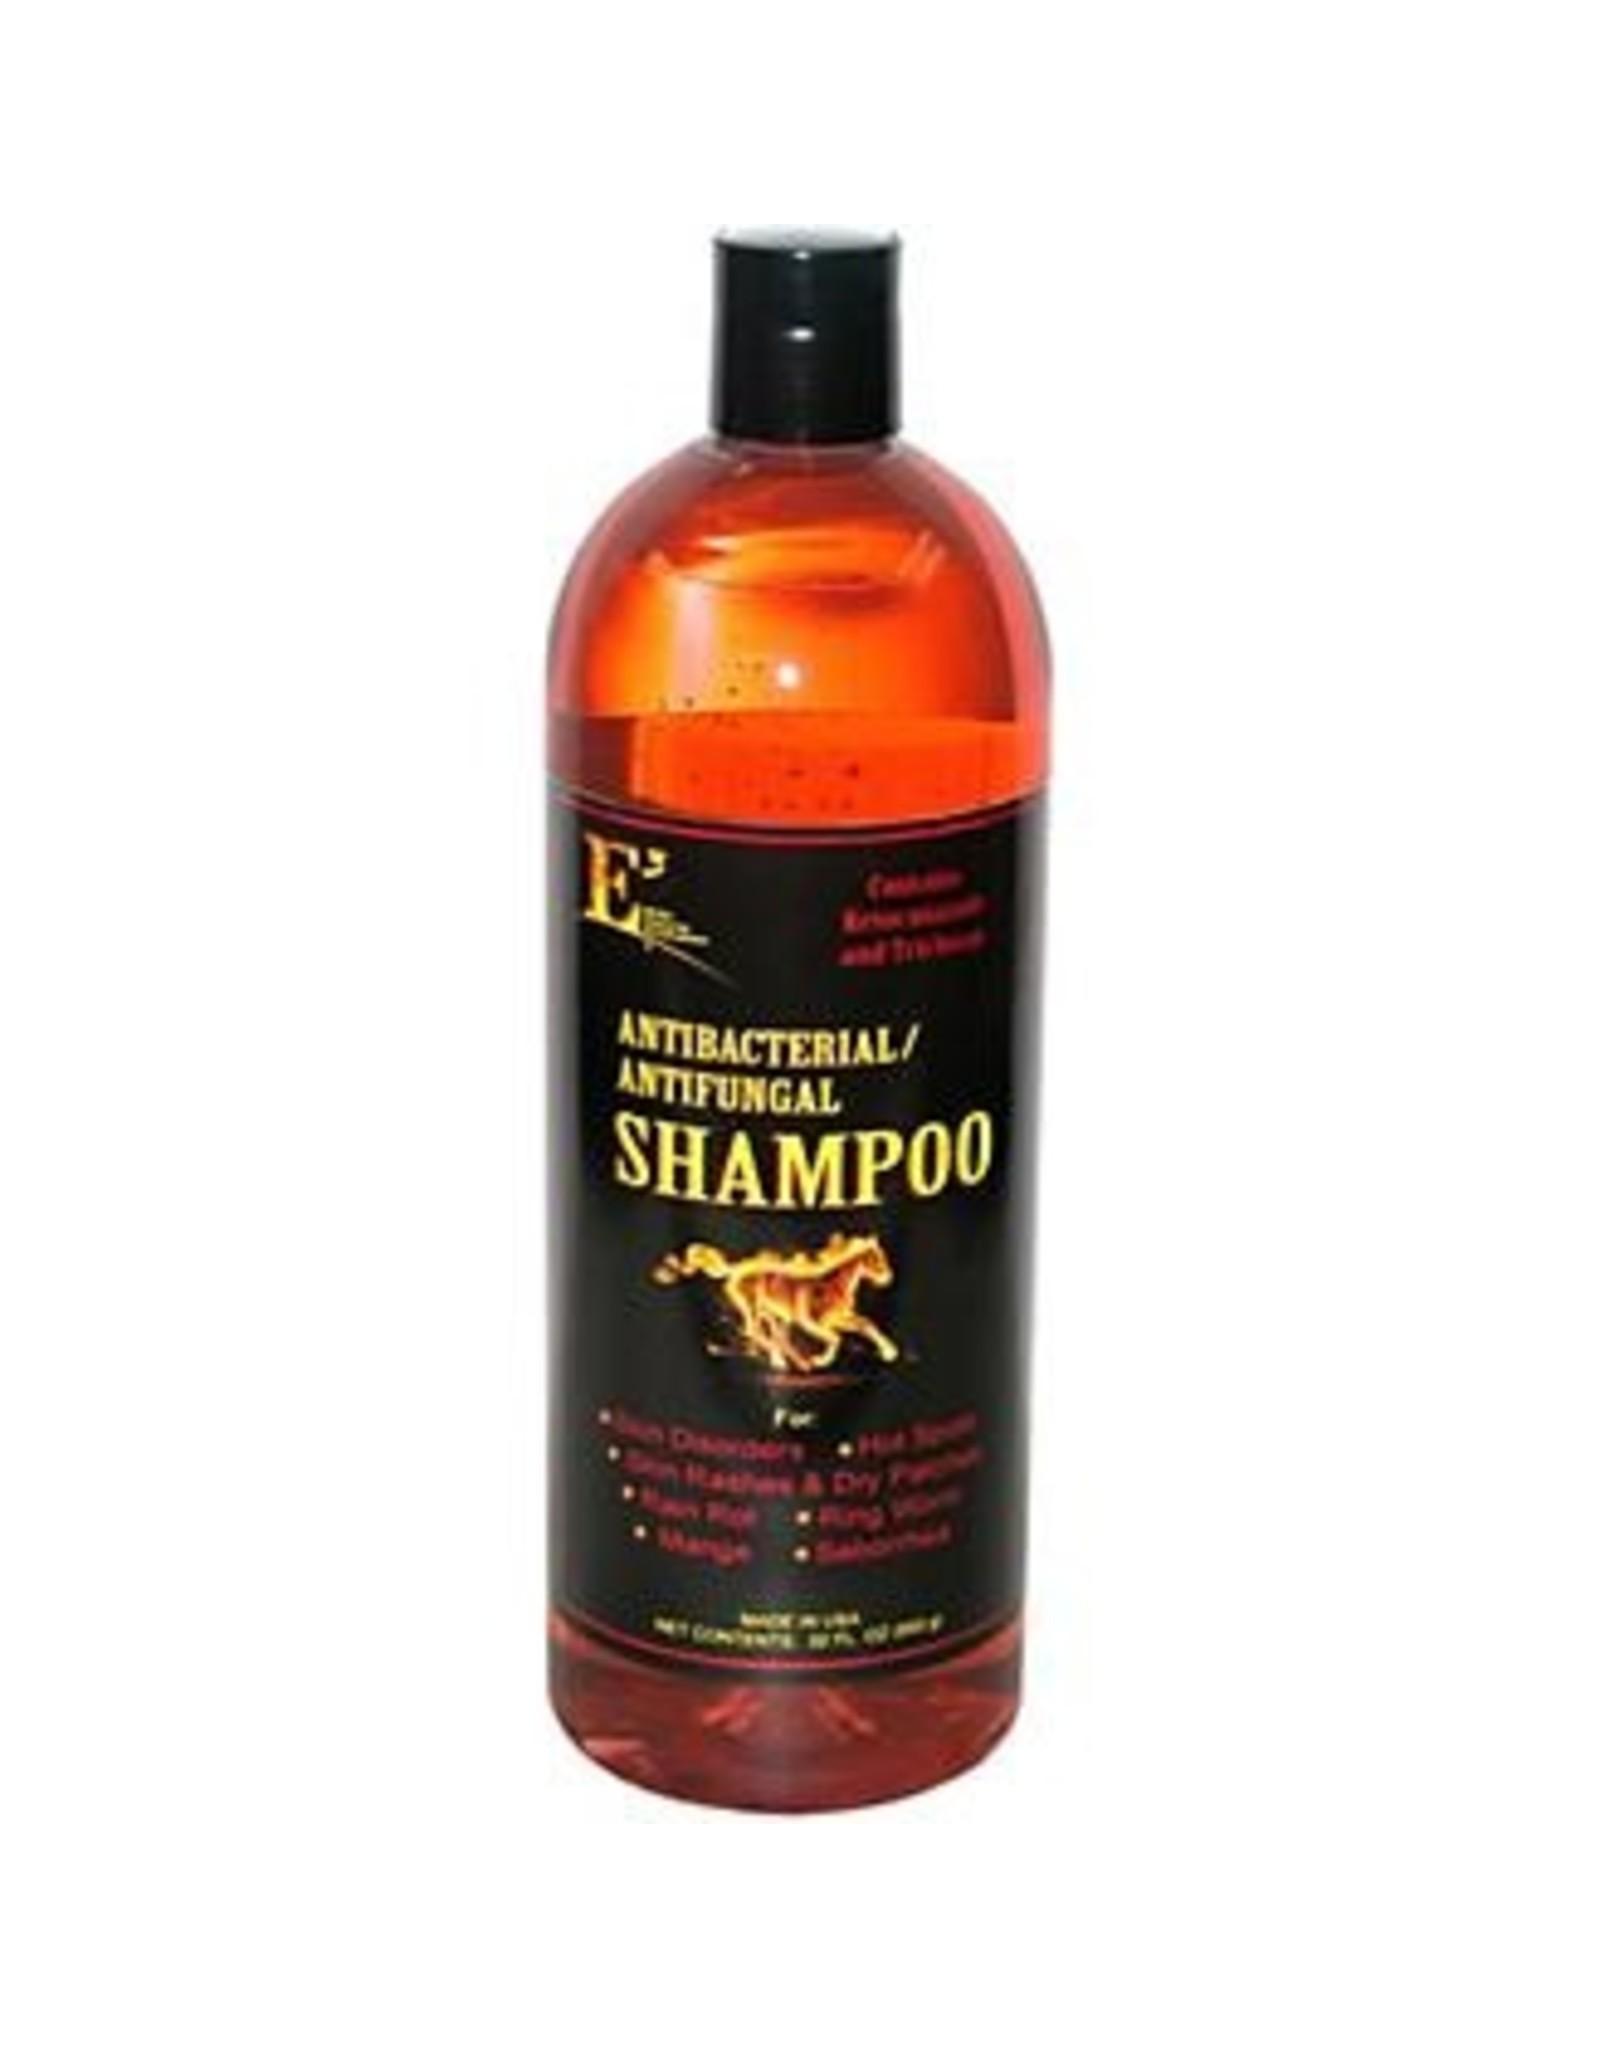 E³ Elite Equine Evolution Antibacterial/Antifungal Shampoo